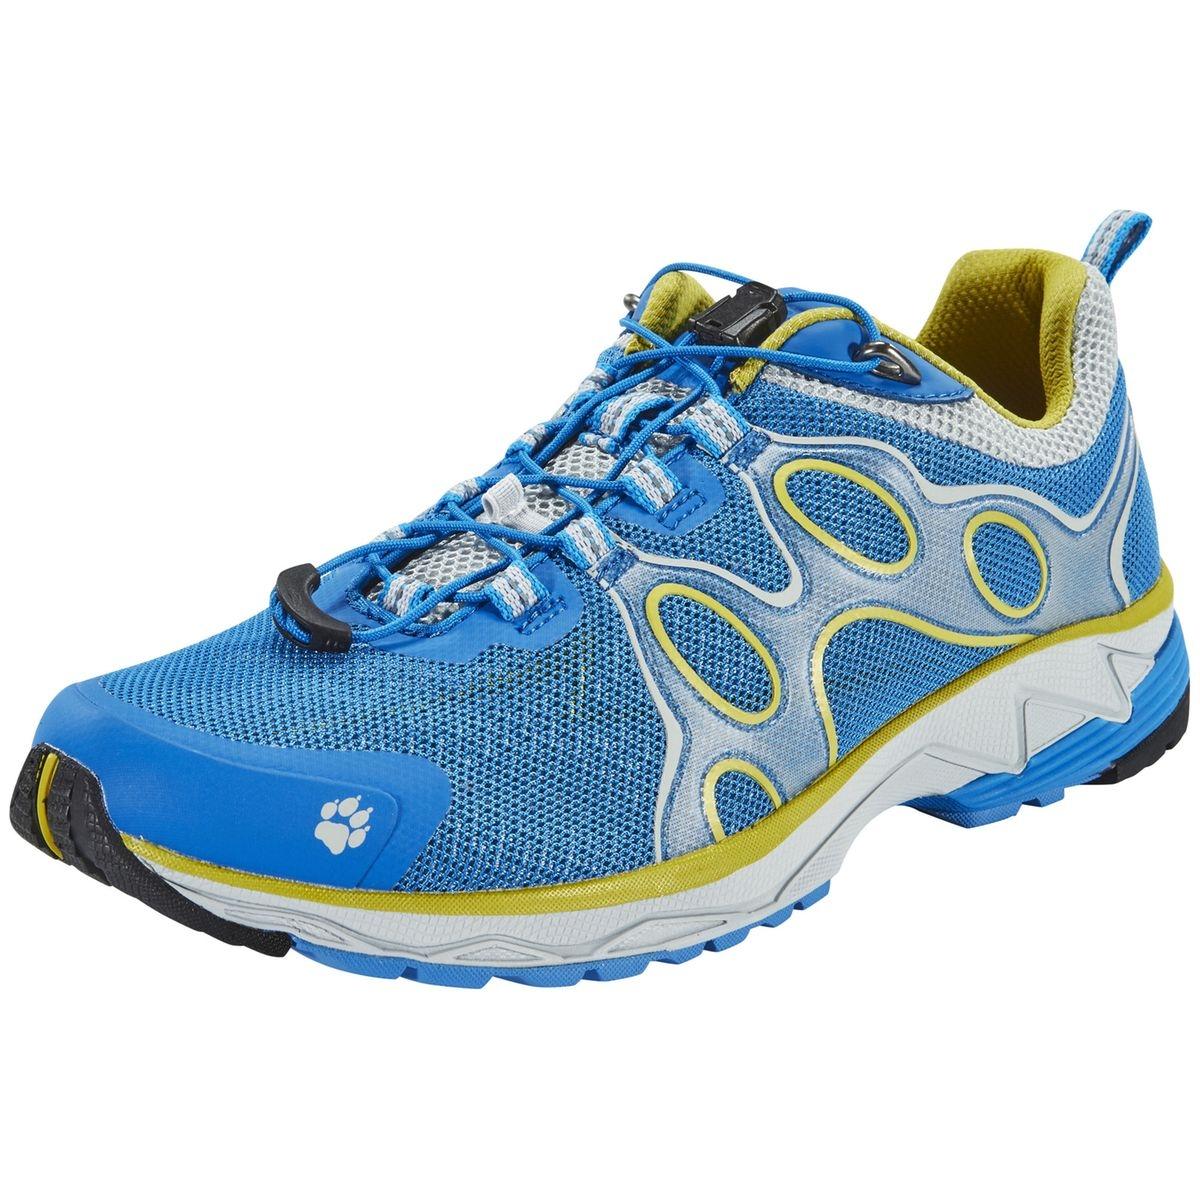 Passion Trail Low - Chaussures de running - jaune/bleu